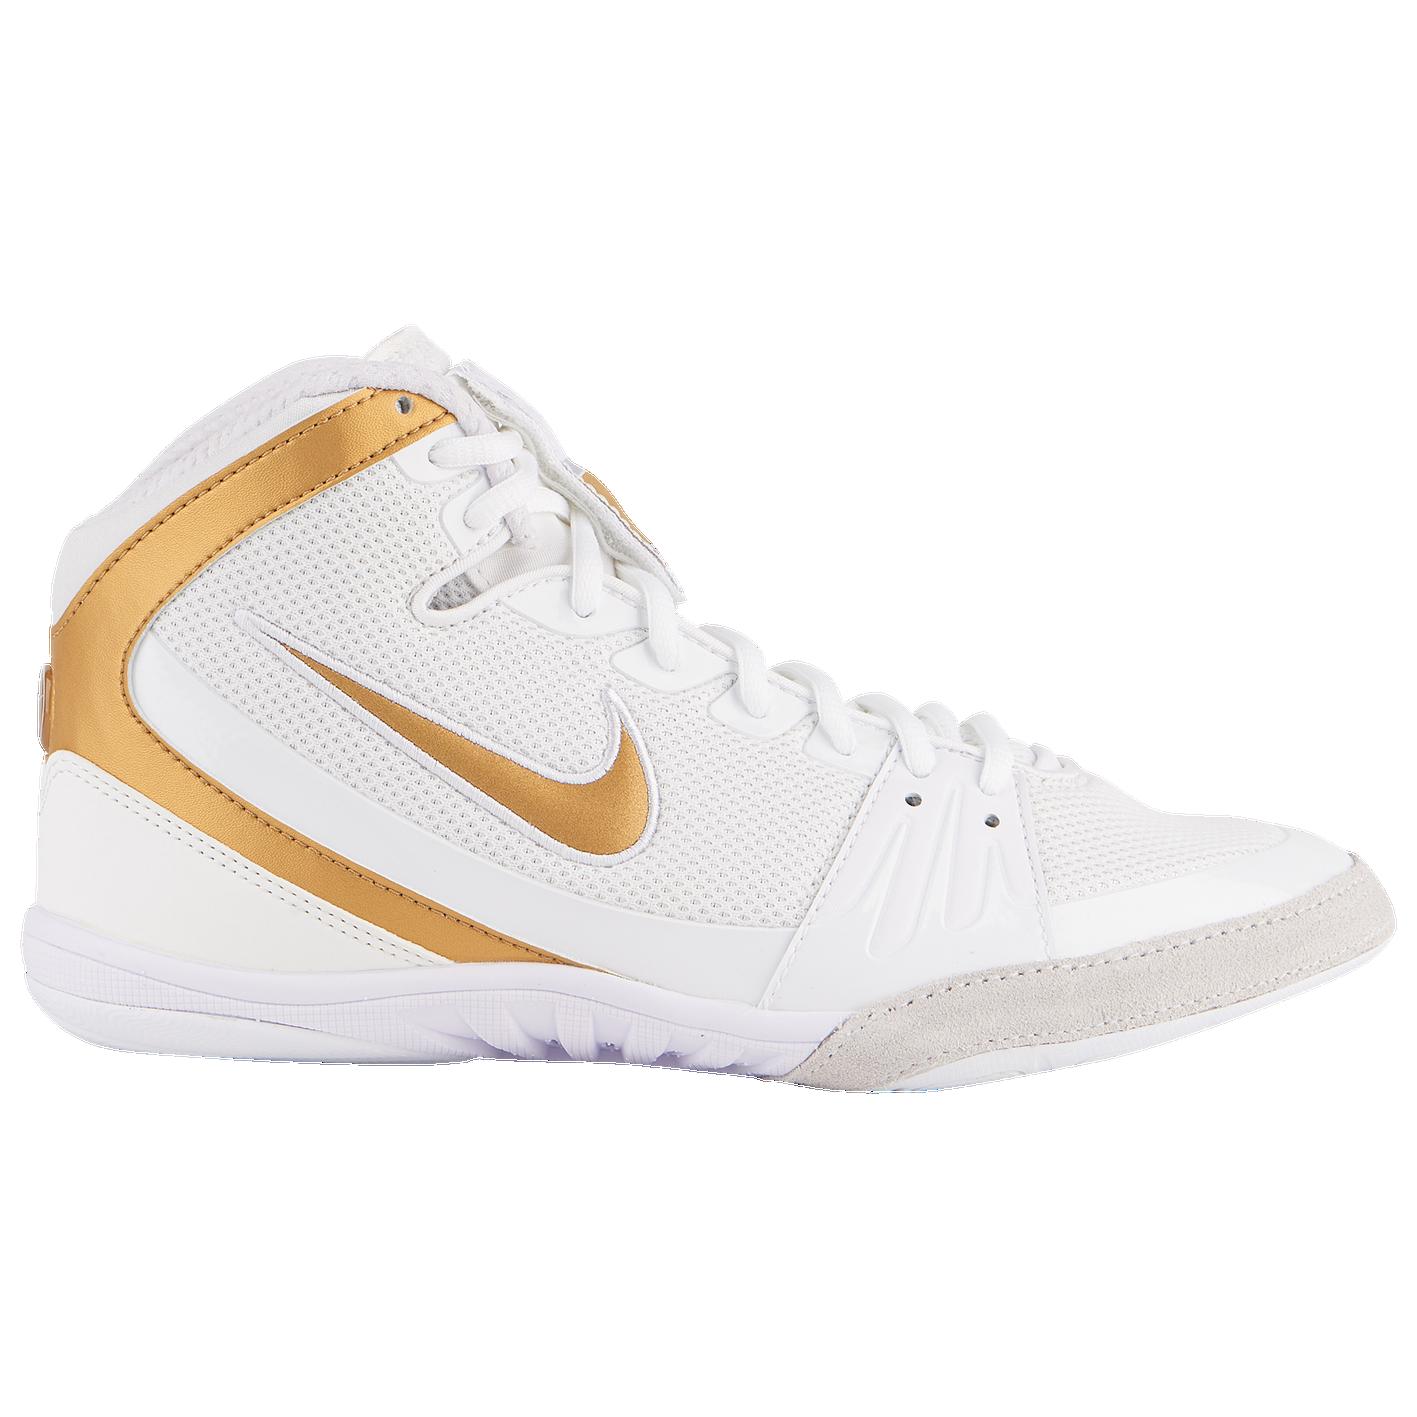 designer fashion 70874 b1809 Nike Freek LE - Men s